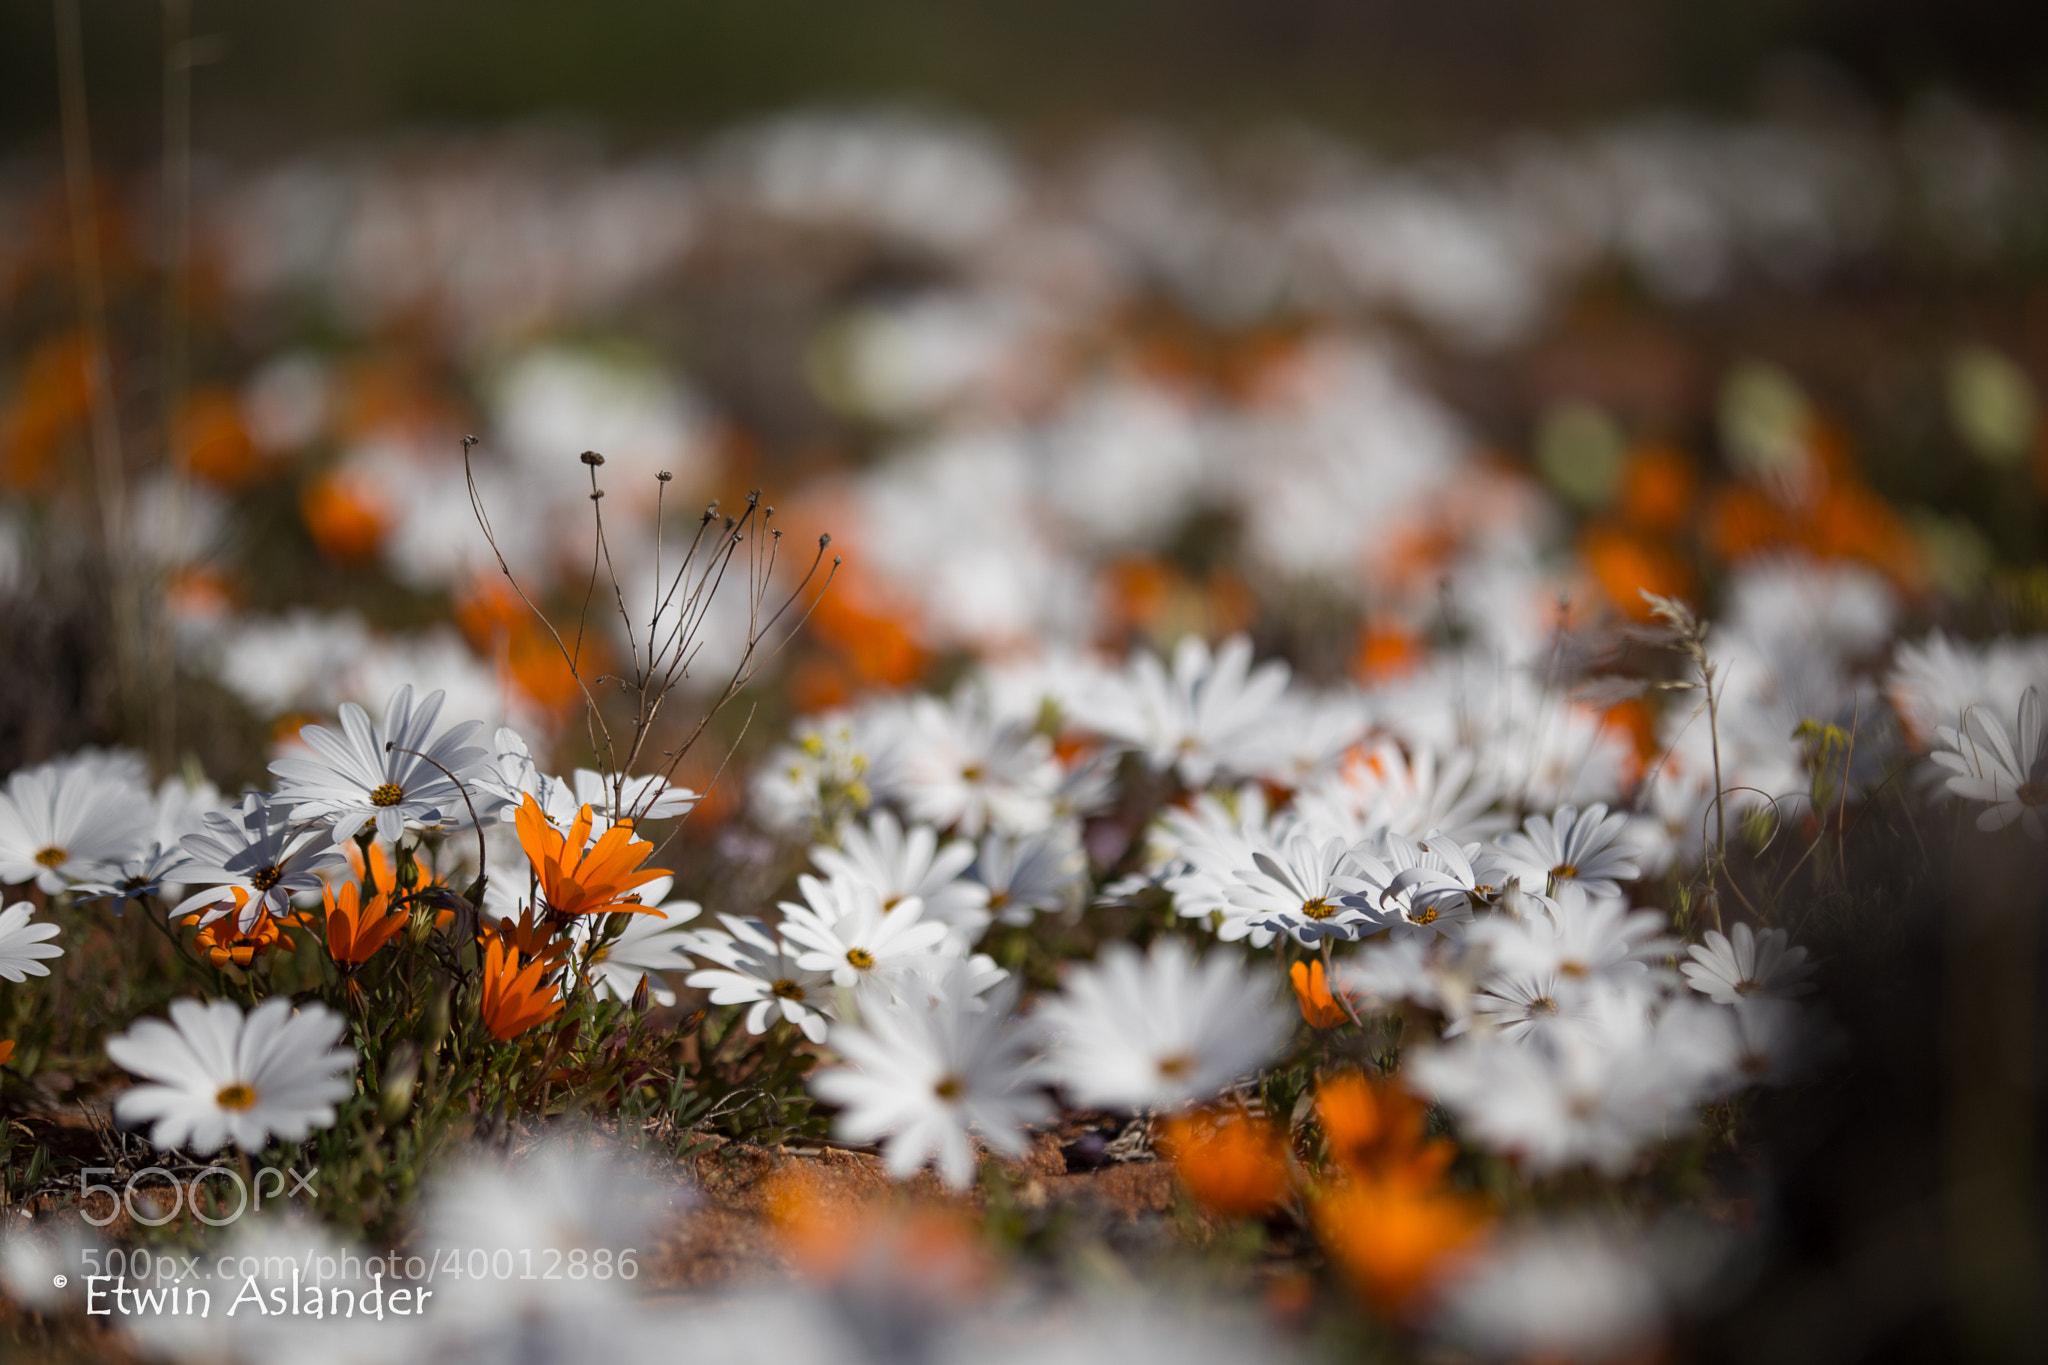 Photograph Daisy's by Etwin  Aslander on 500px